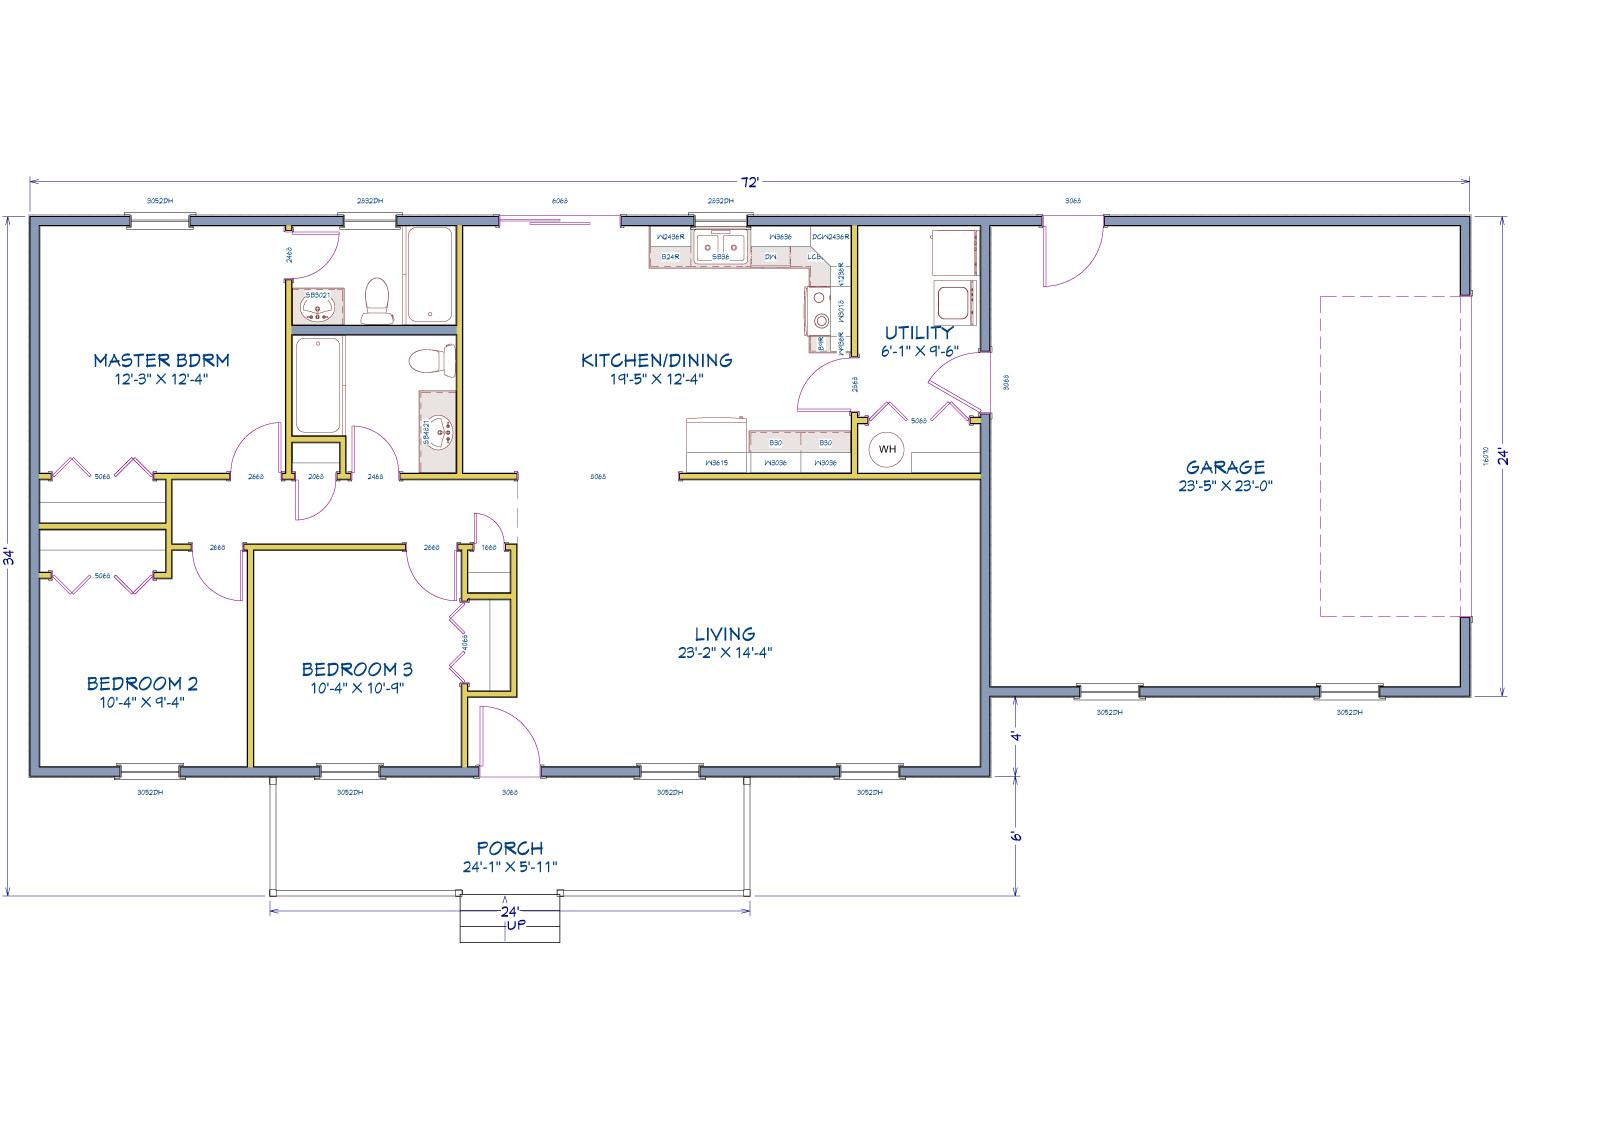 House plan drawing for the Caroline II Floor Plan